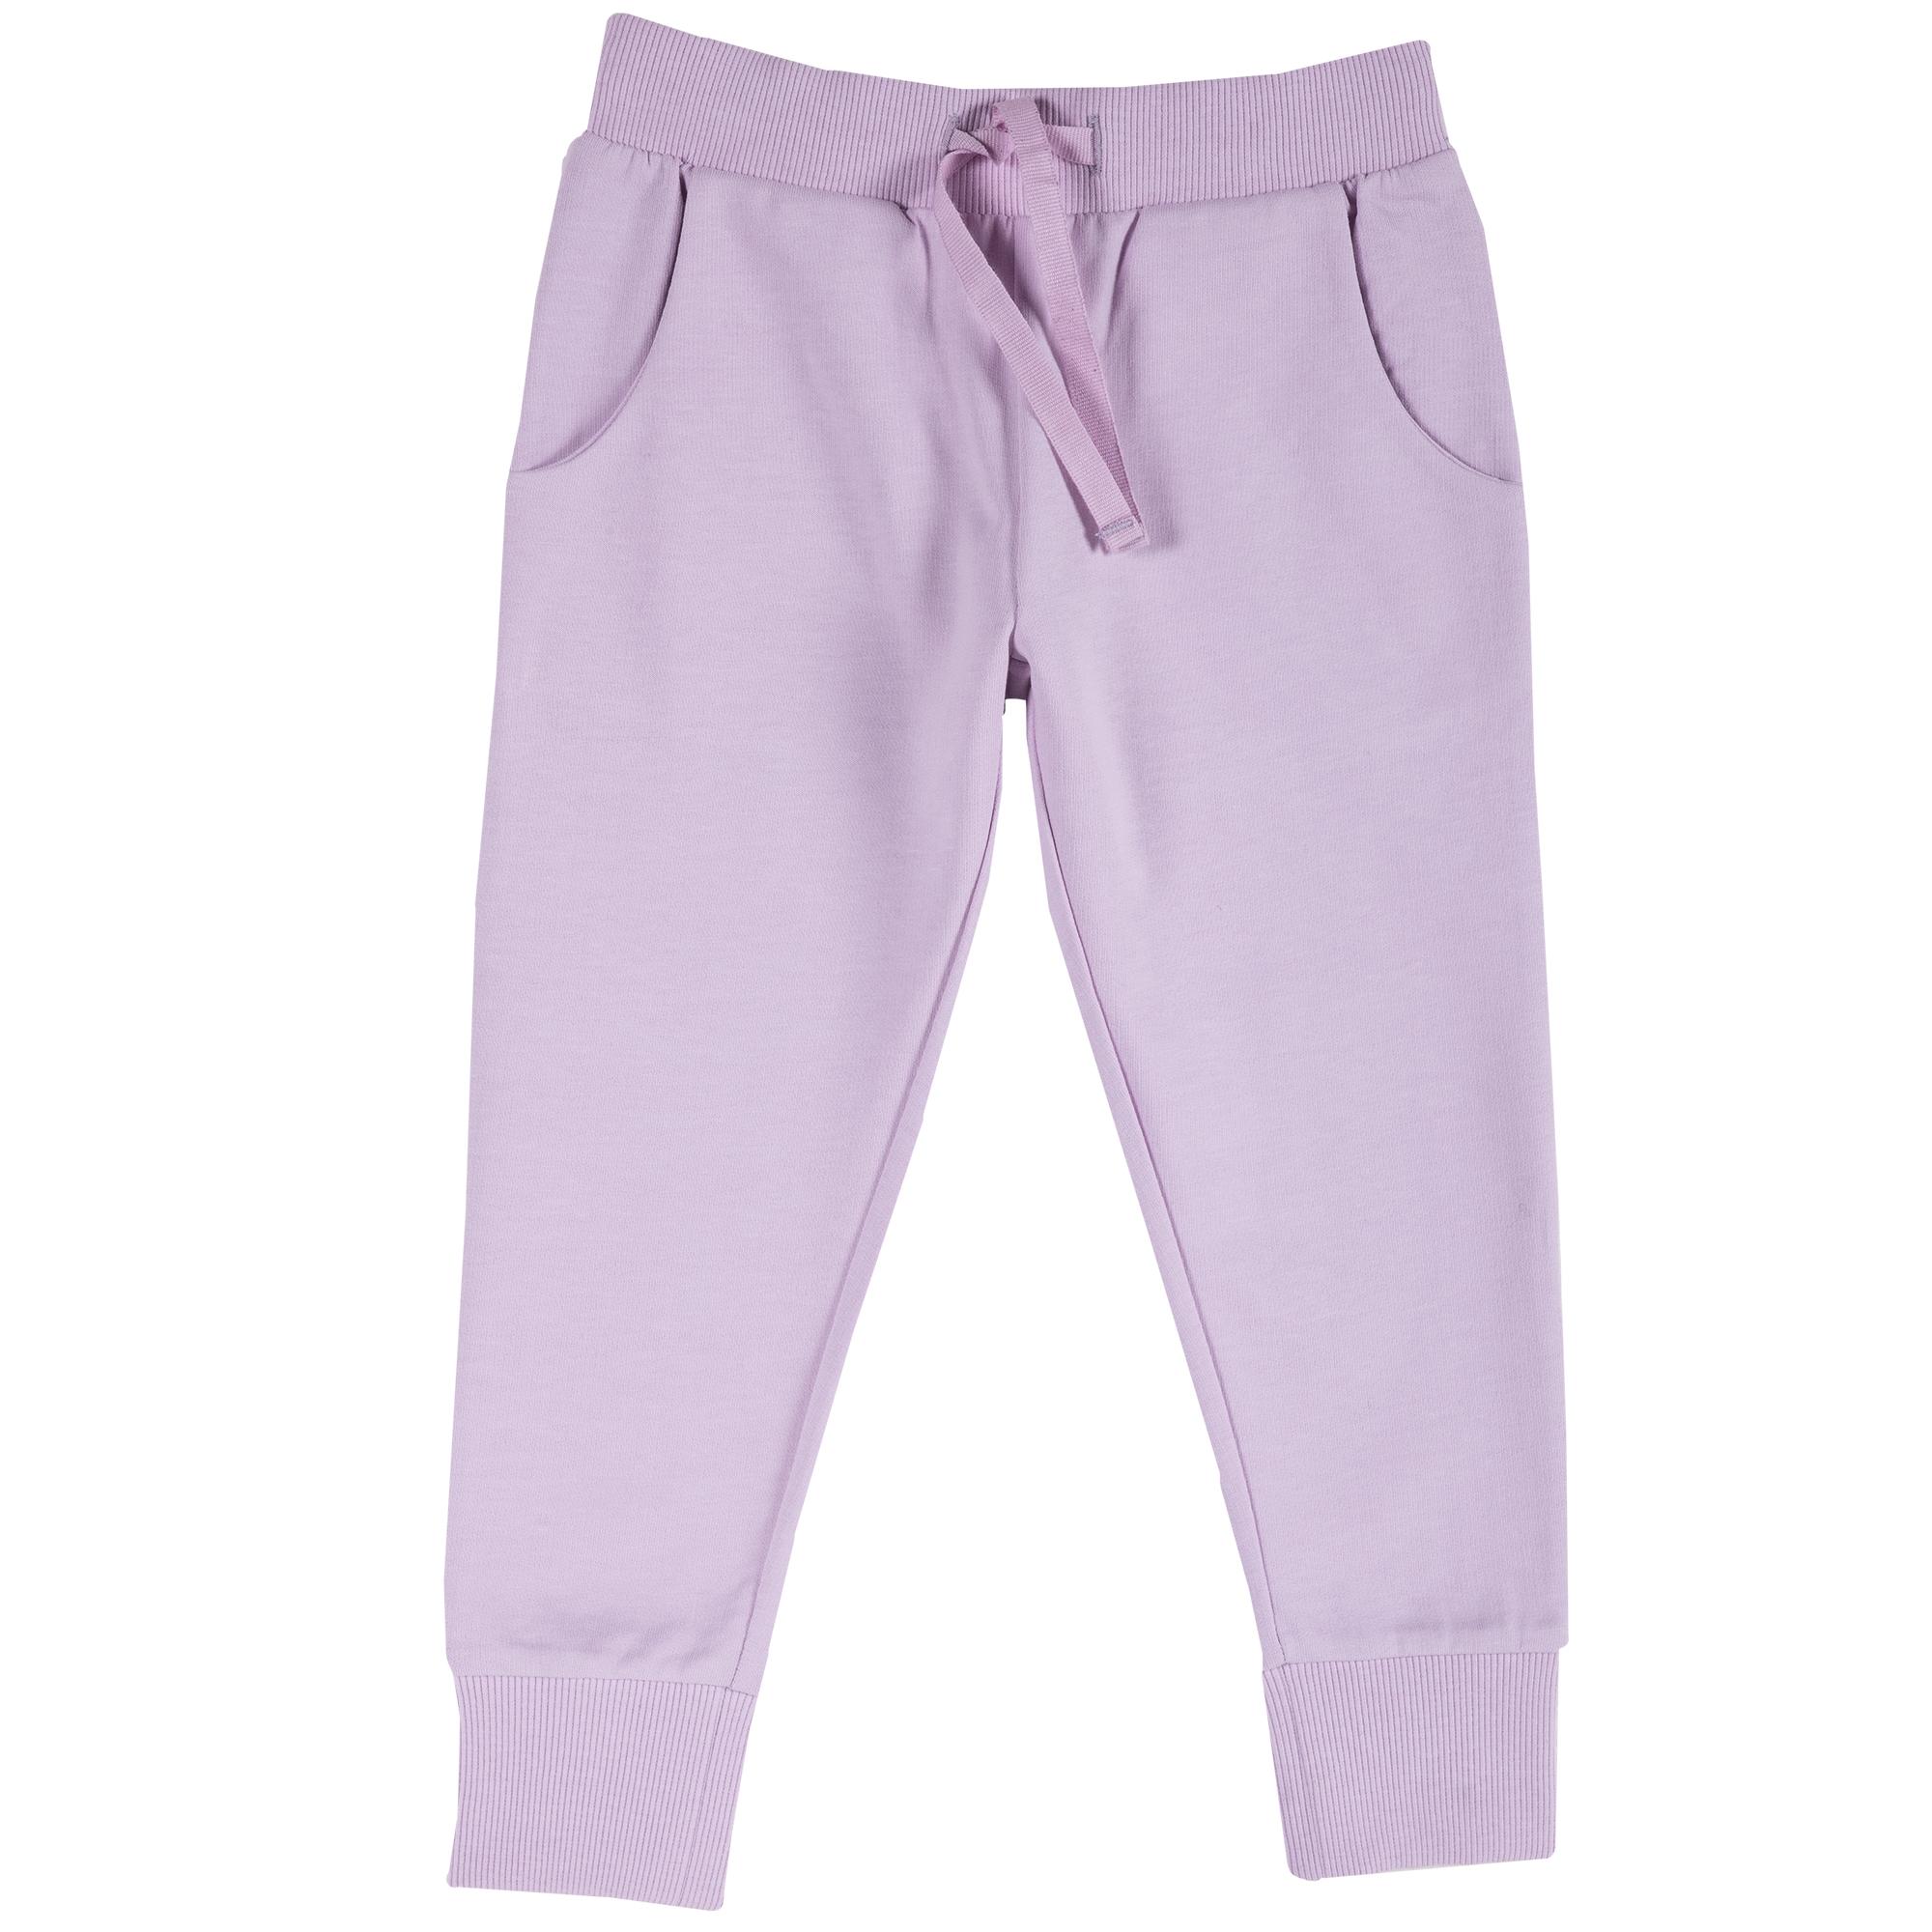 Pantalon trening copii Chicco, manseta elastica, lila, 24932 din categoria Pantaloni copii